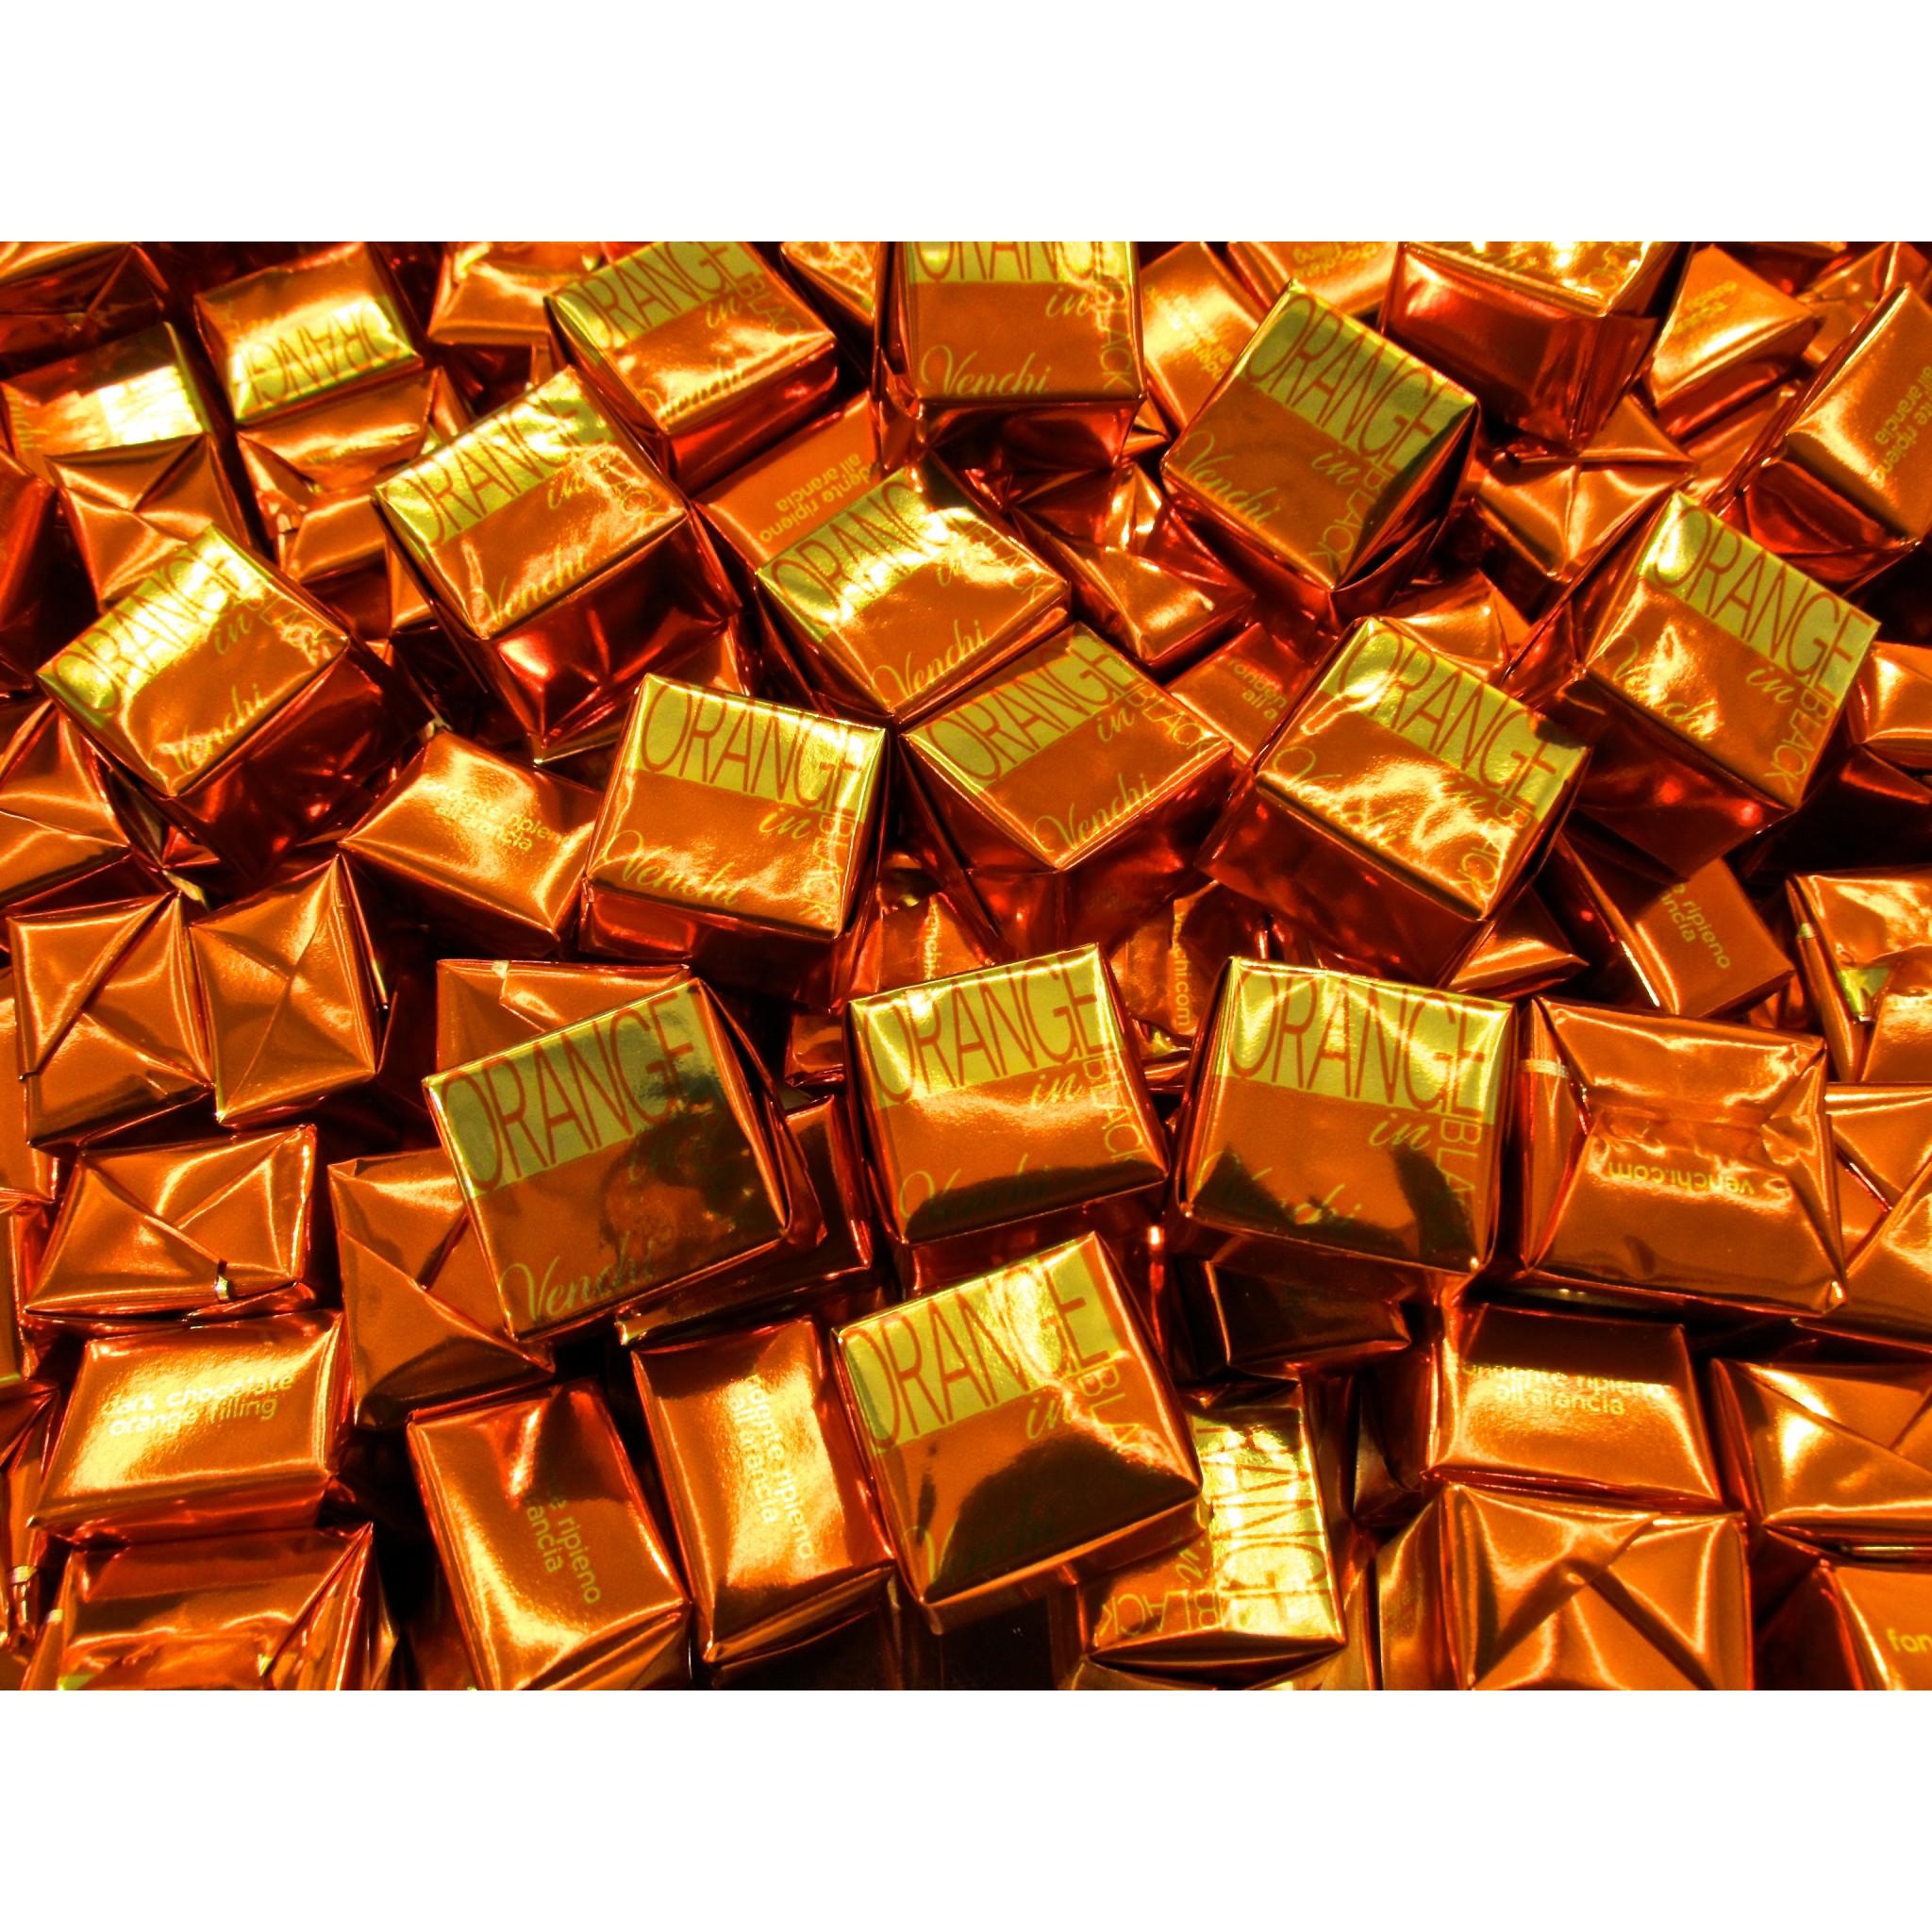 Online Sales Venchi Chocolates Wedge News 2015 Orange